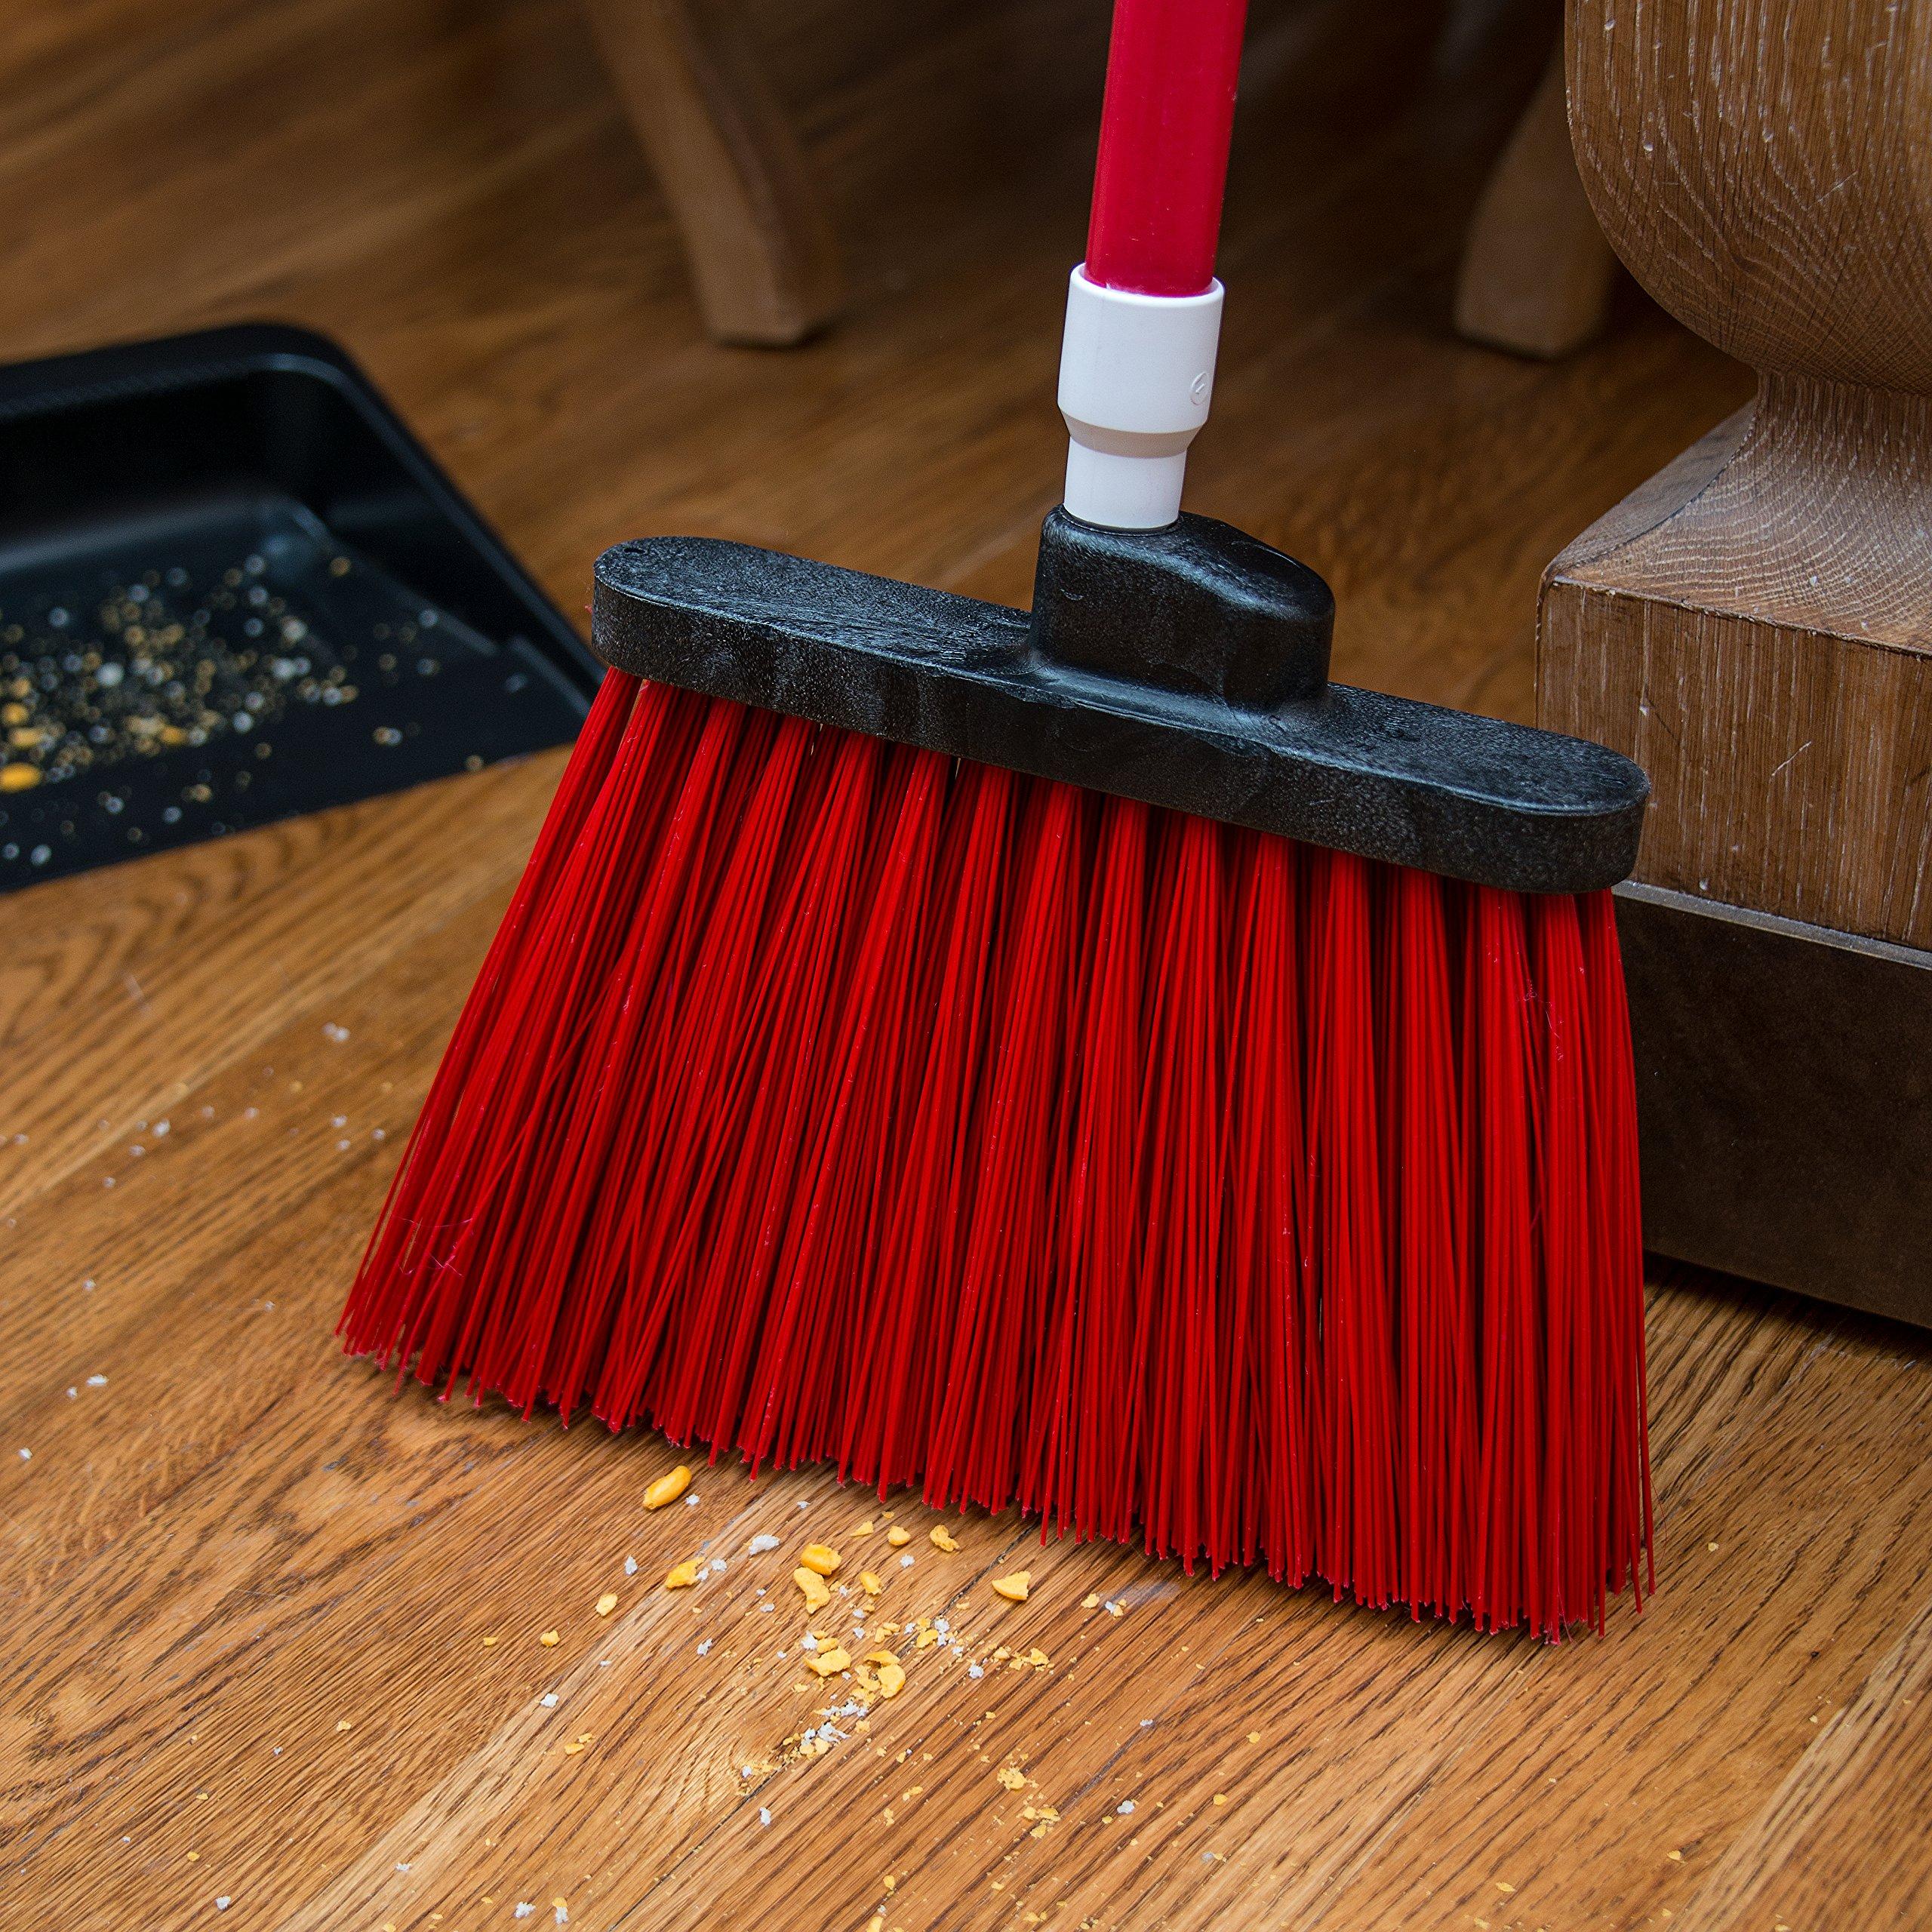 Carlisle 3686805 Duo-Sweep UnFlagged Angle Broom Head, 8'', Red by Carlisle (Image #5)